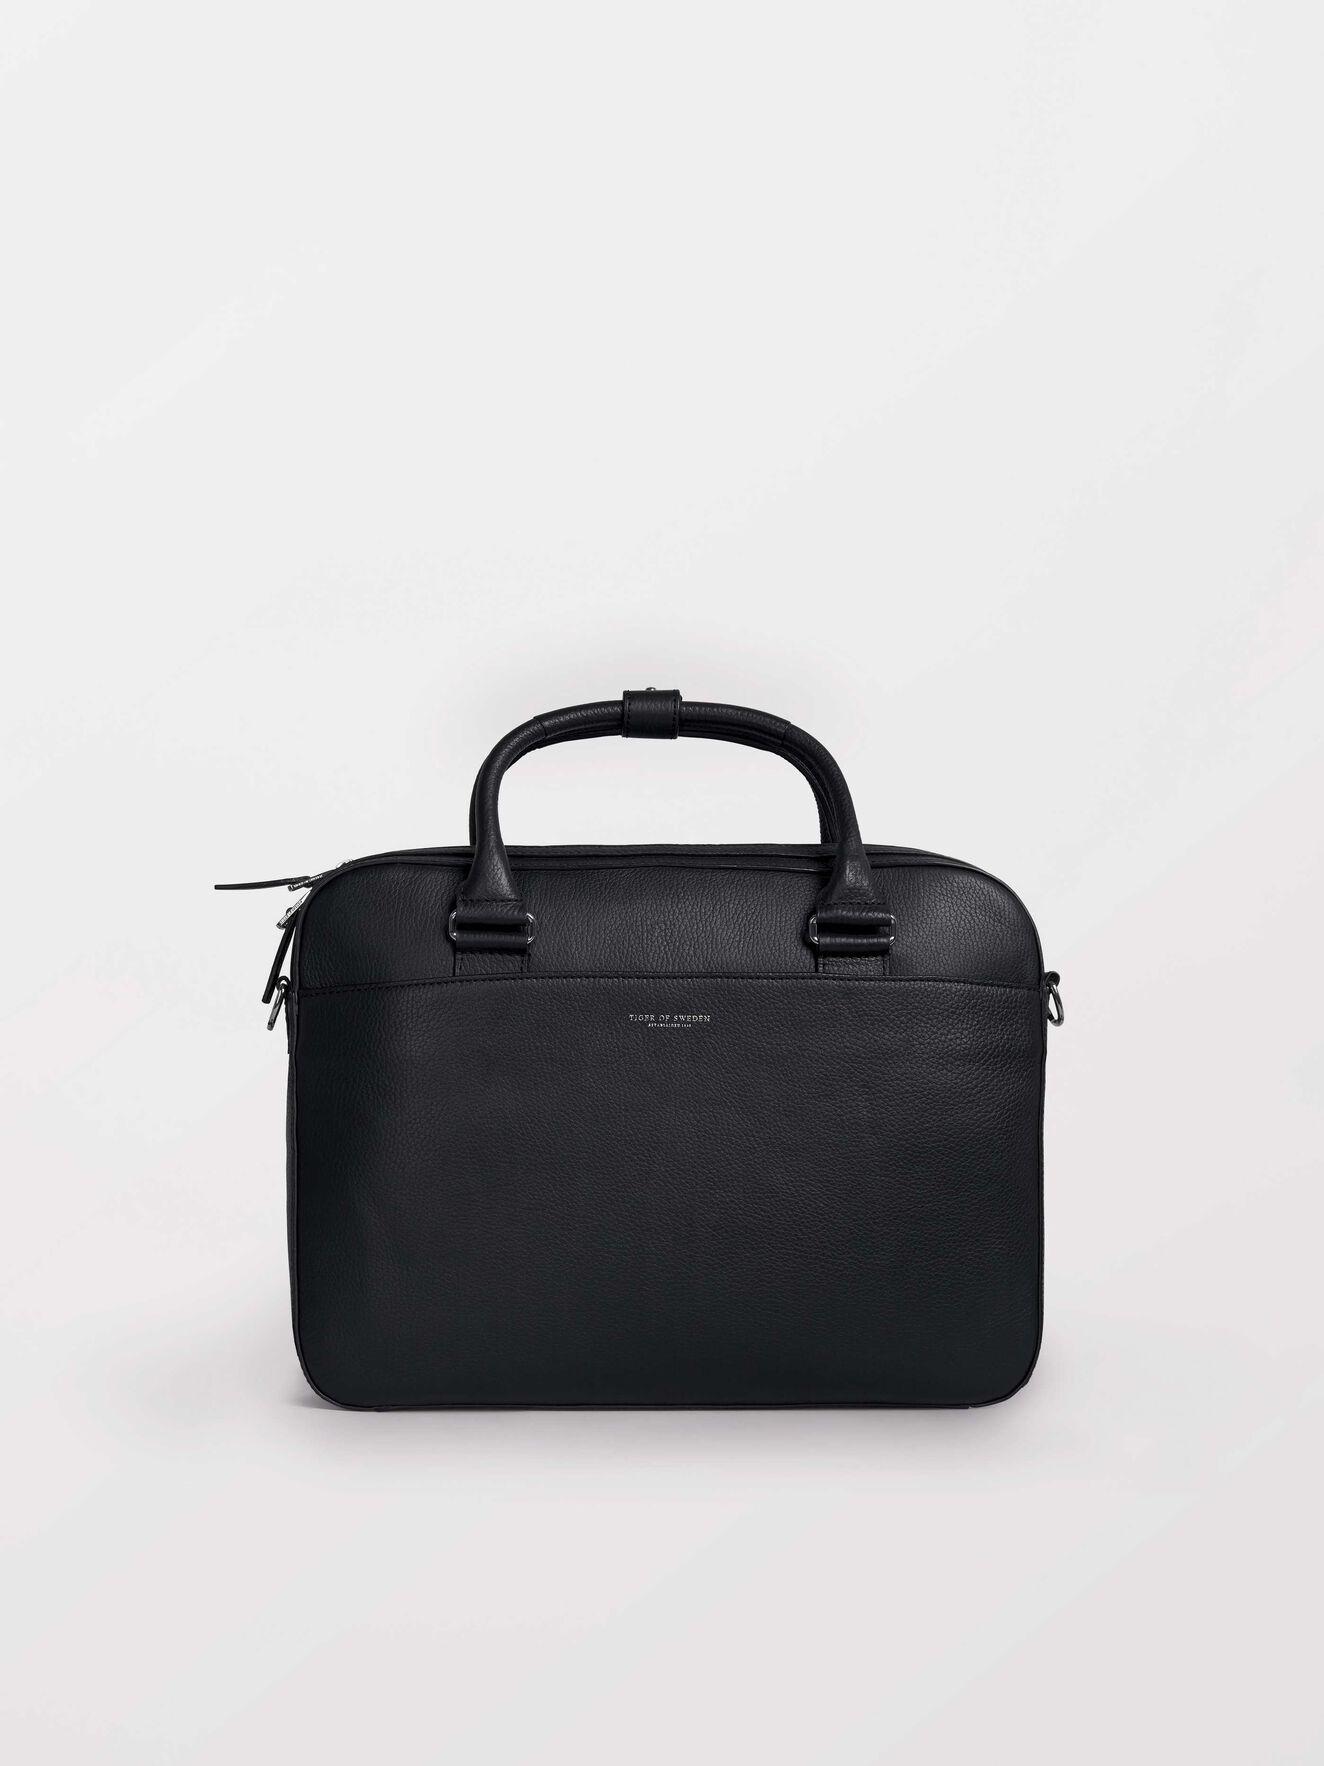 Dalio 2 Briefcase in Black from Tiger of Sweden